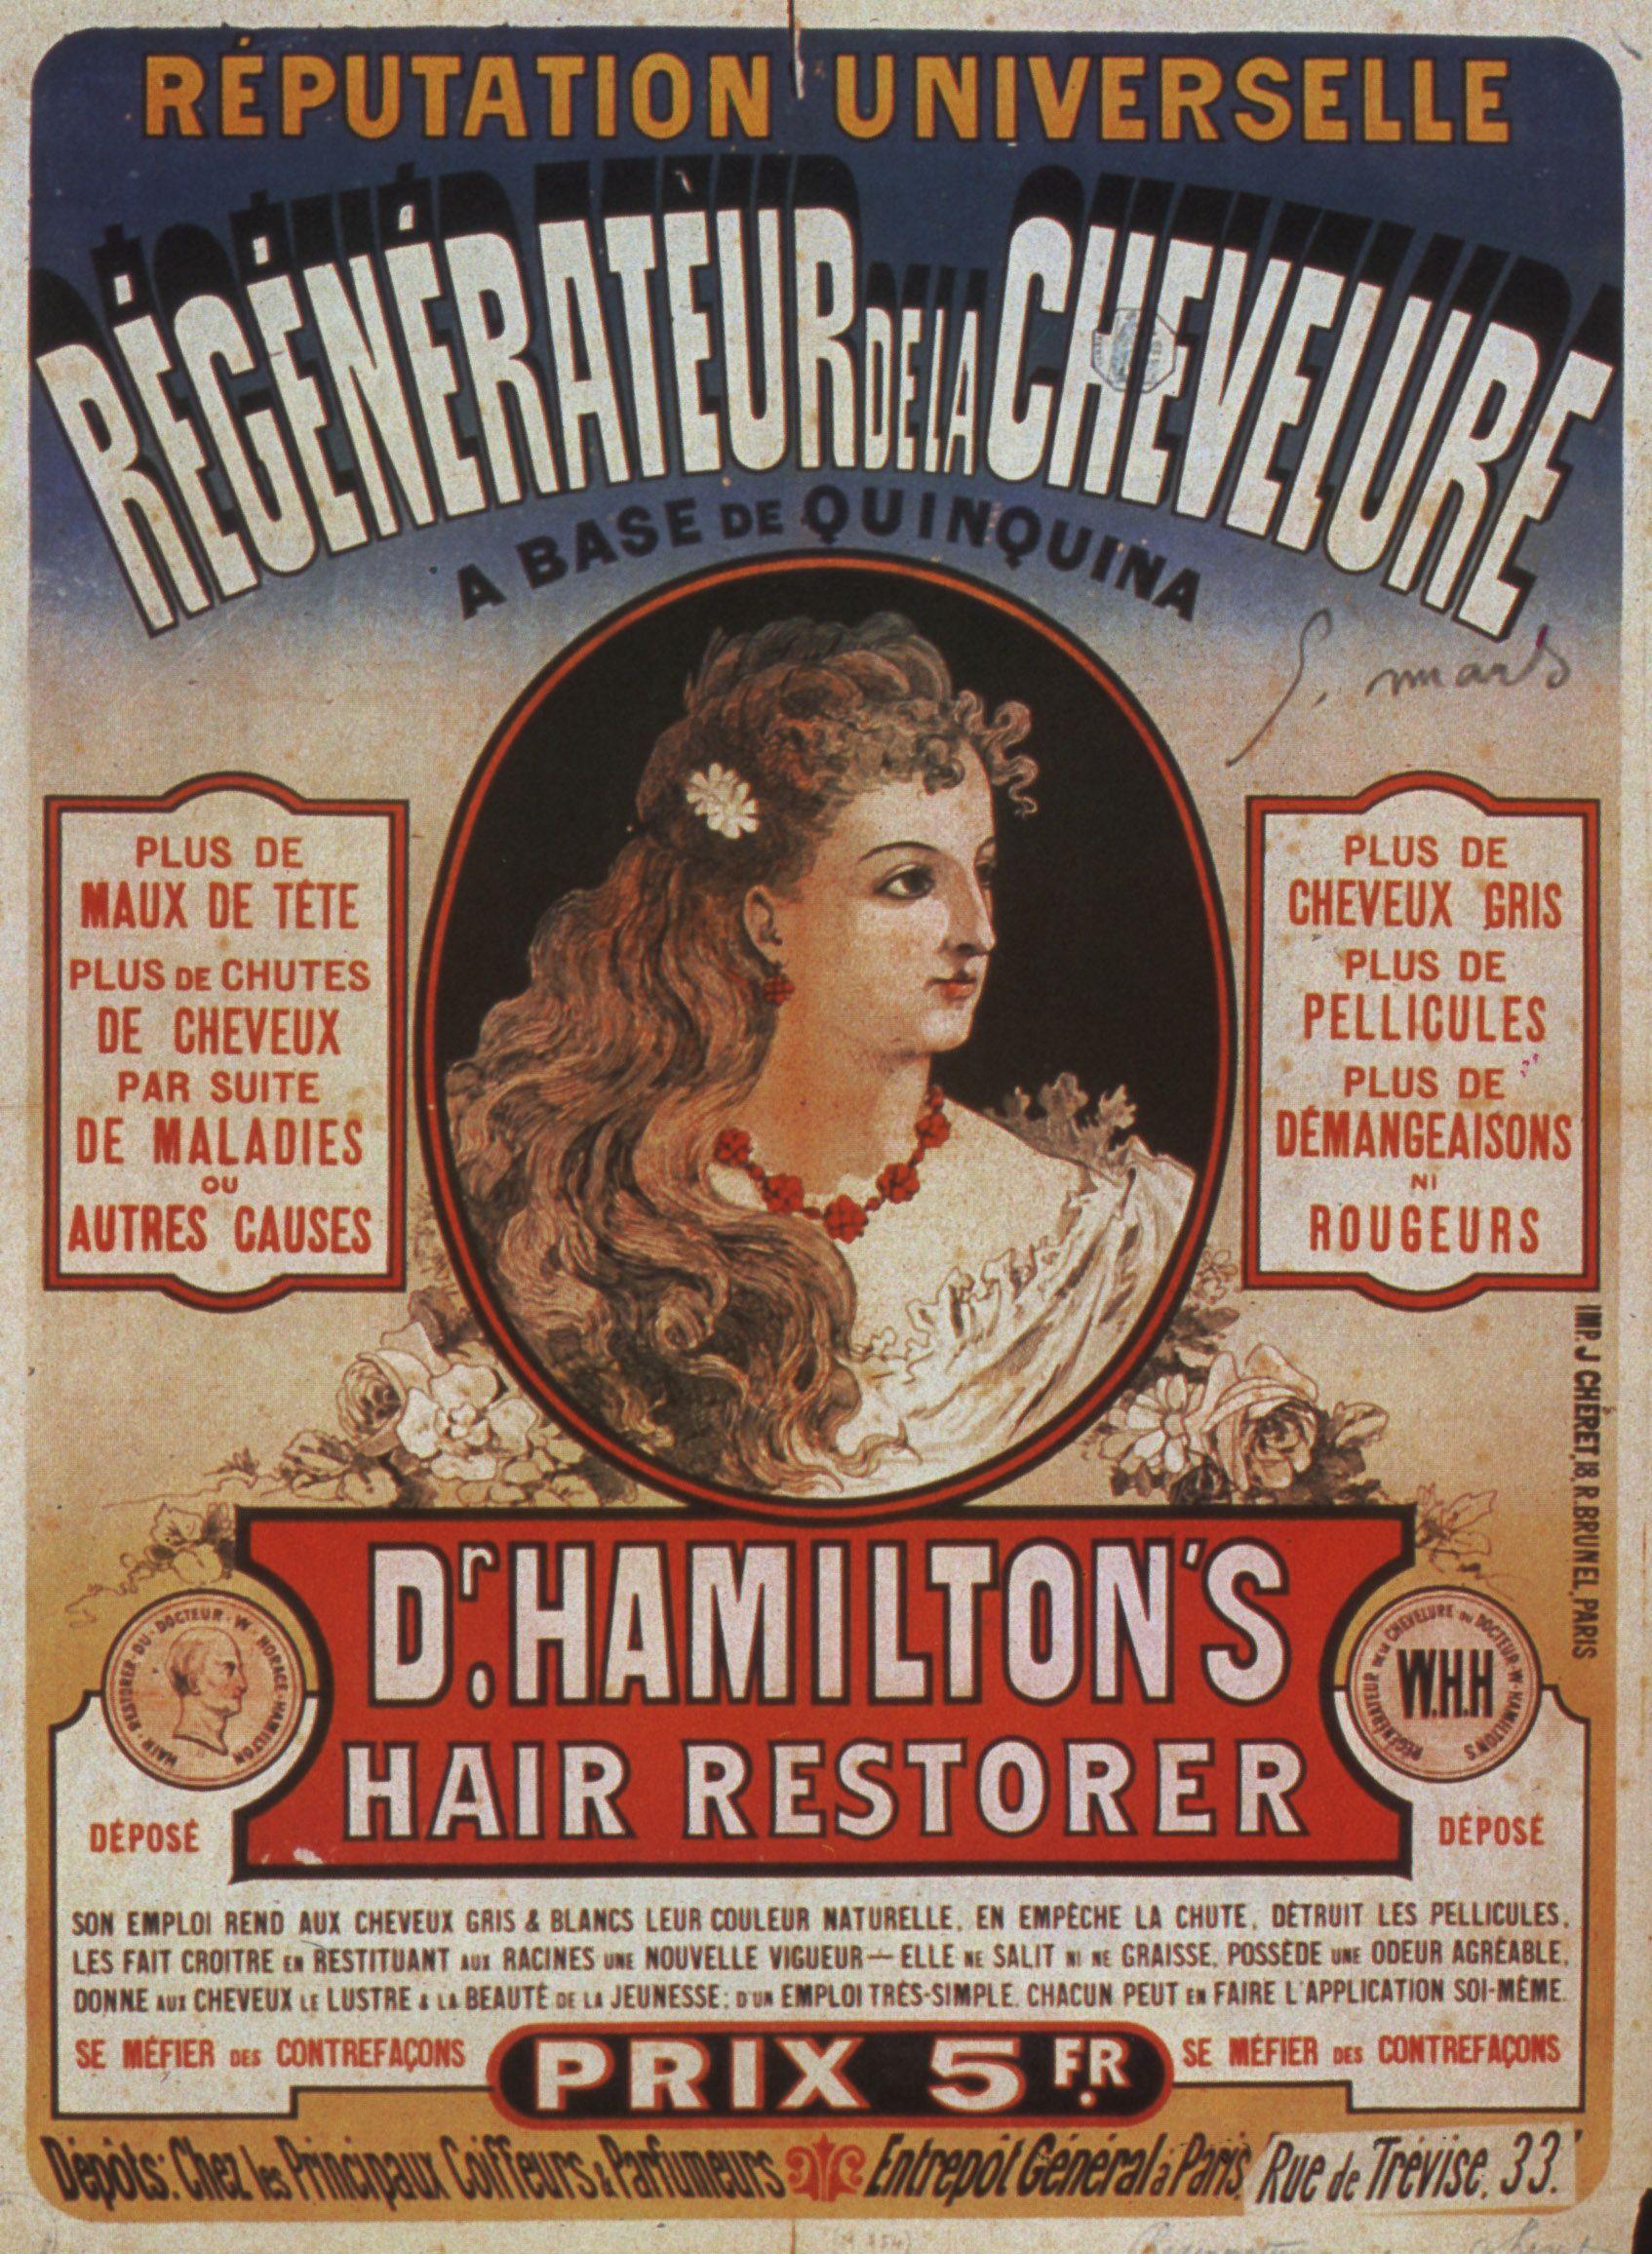 Vintage Advertising Posters | ... we'll look at 30 vintage advertising poster designs to inspire you